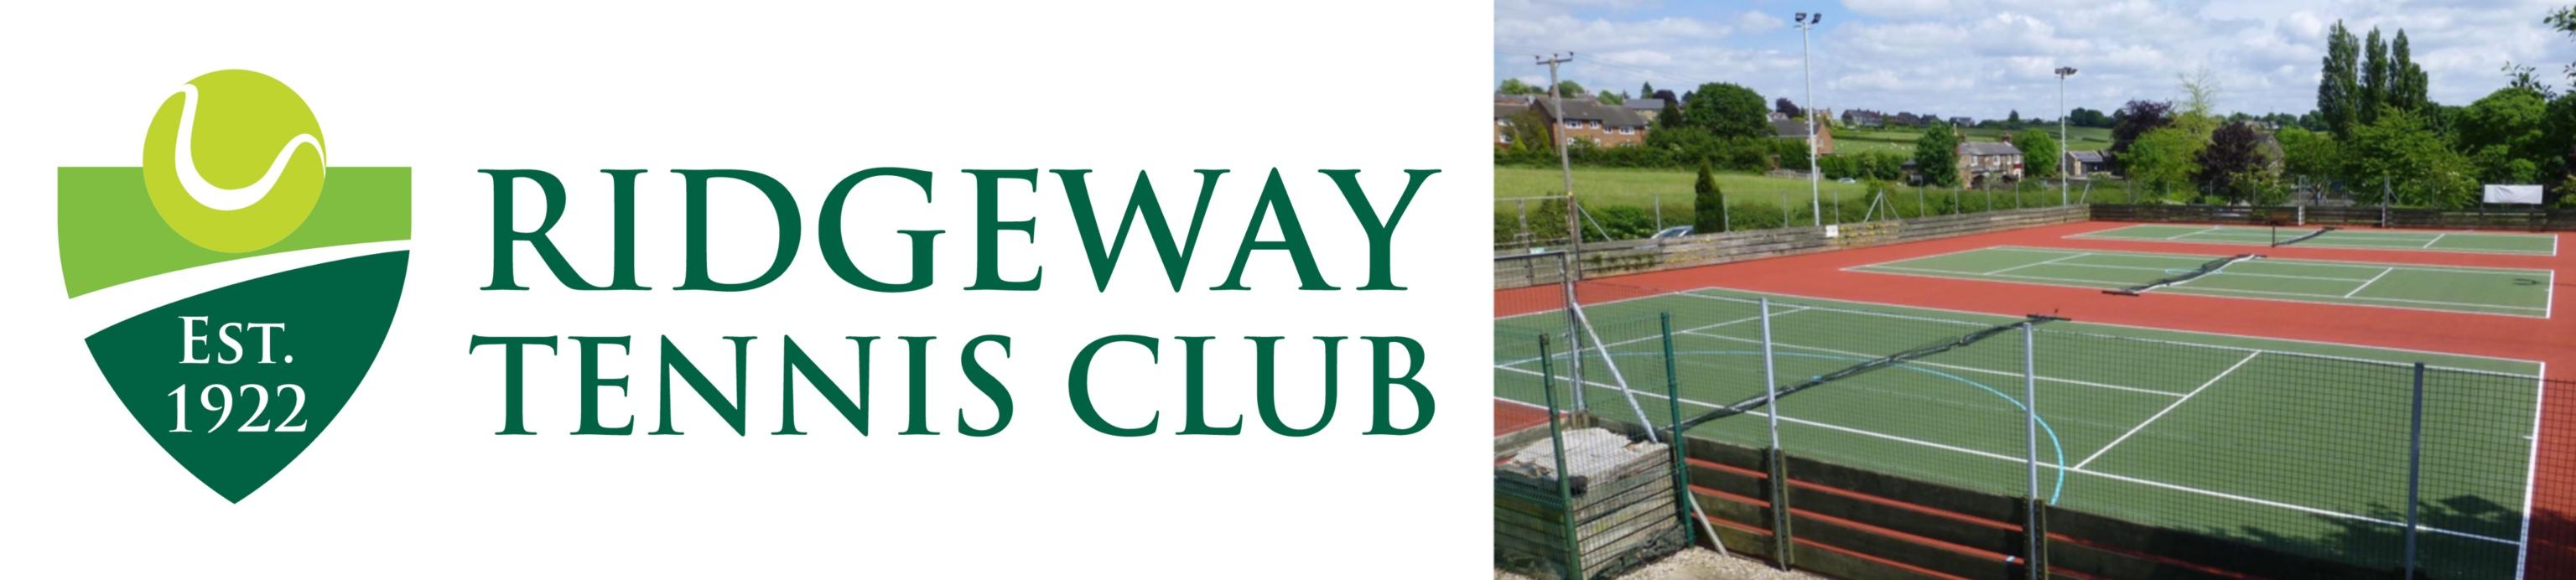 Ridgeway Tennis Club